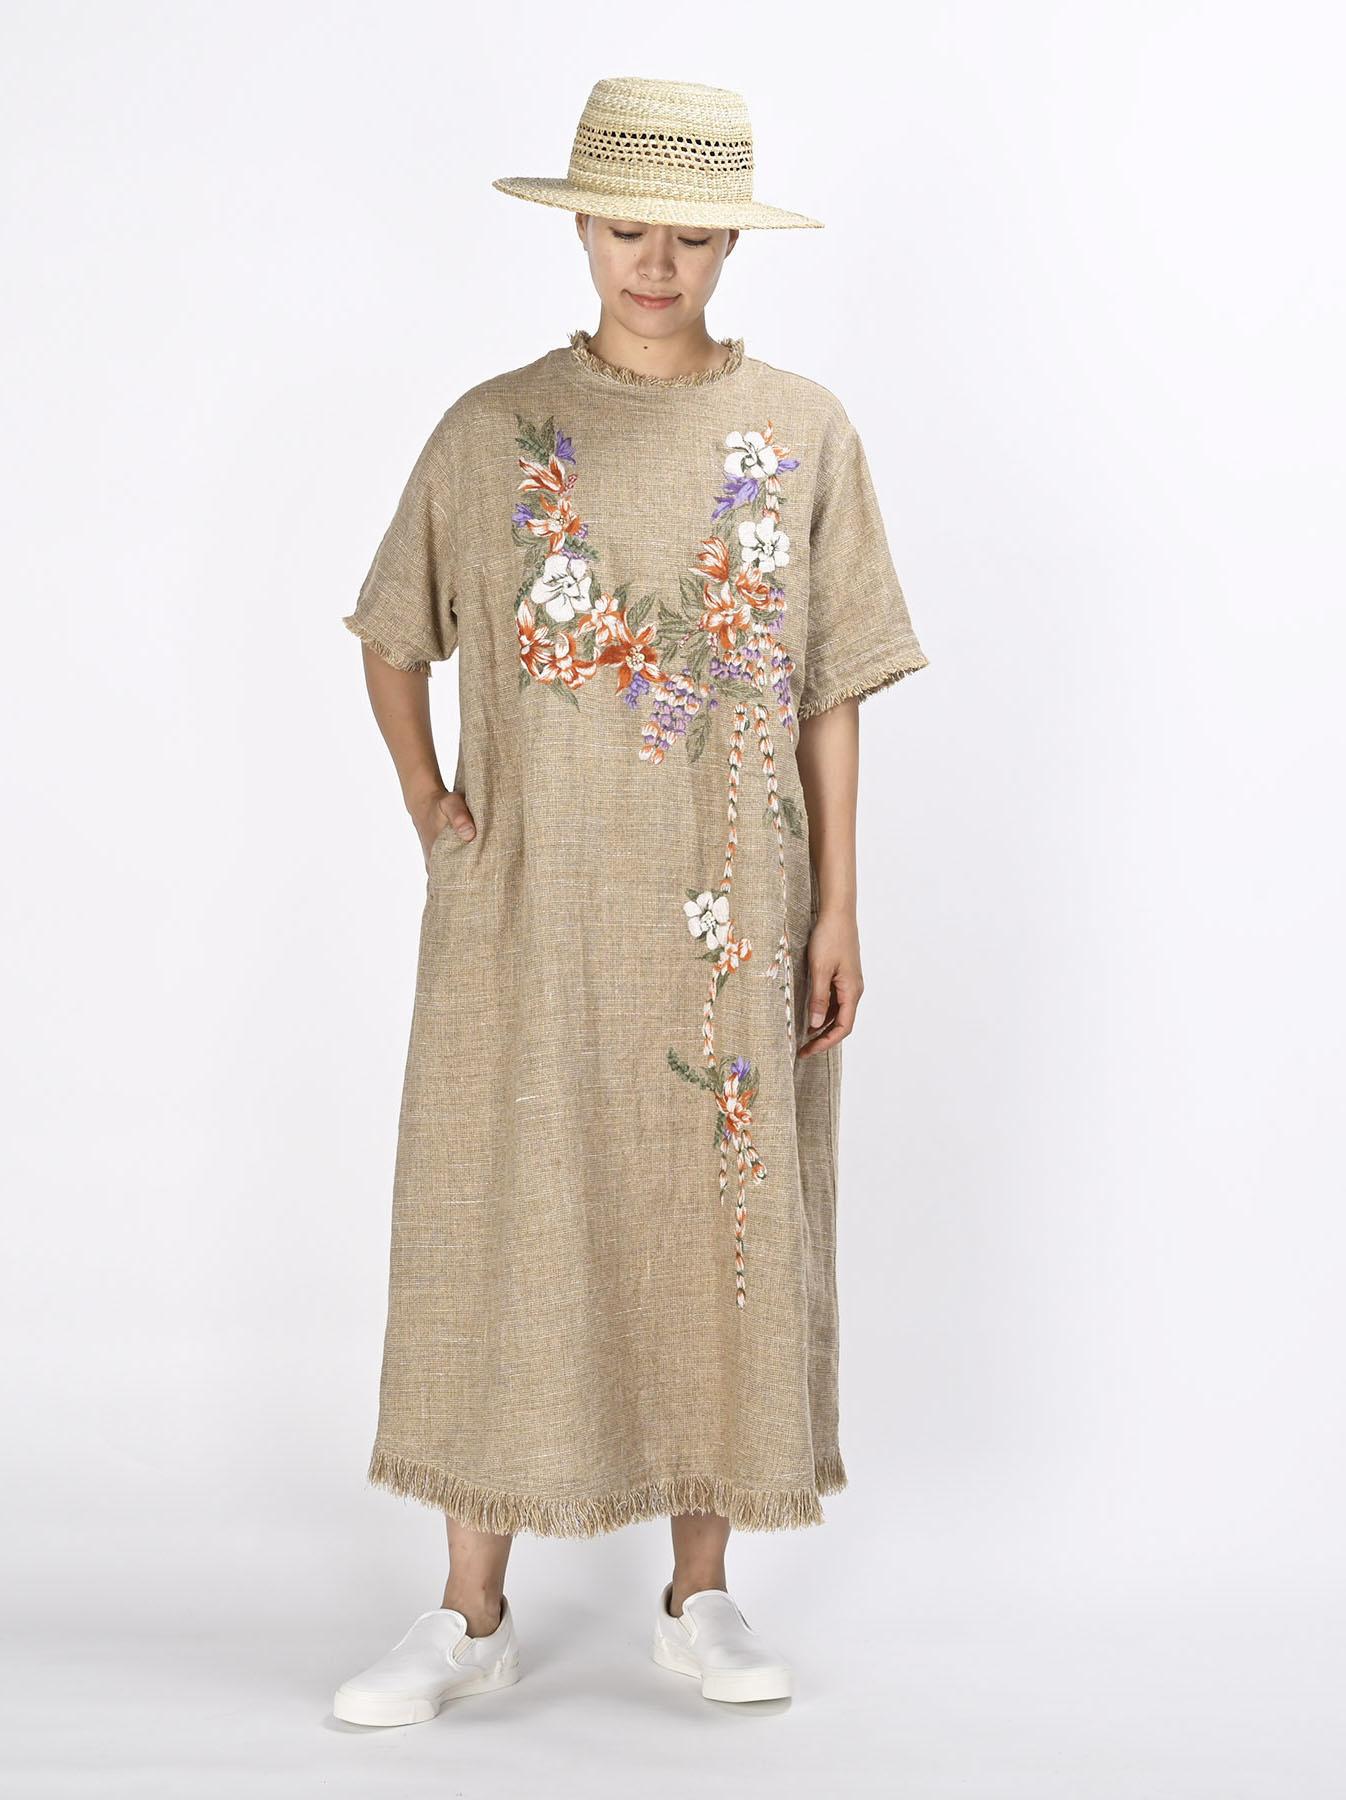 Gima Tweed Leilei Embroidery Dress-2